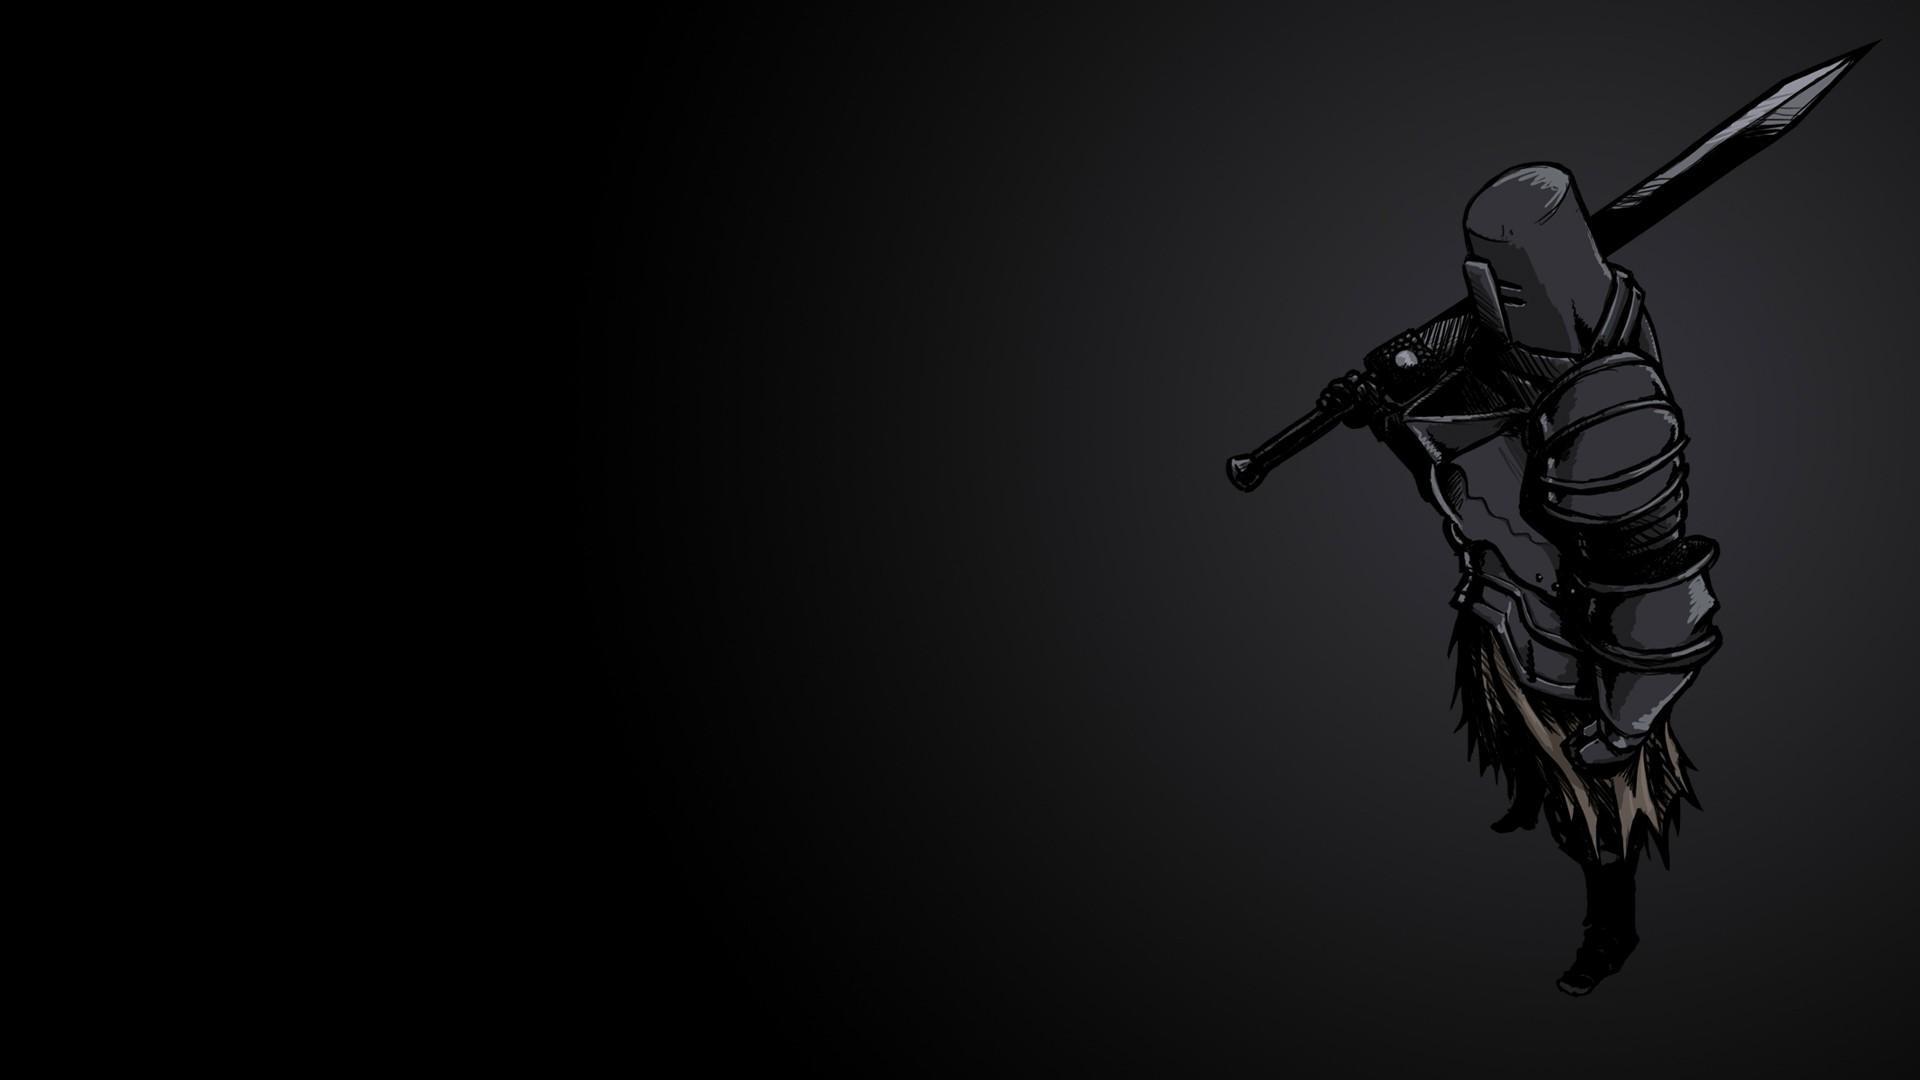 Dark-wallpaper-HD-souls